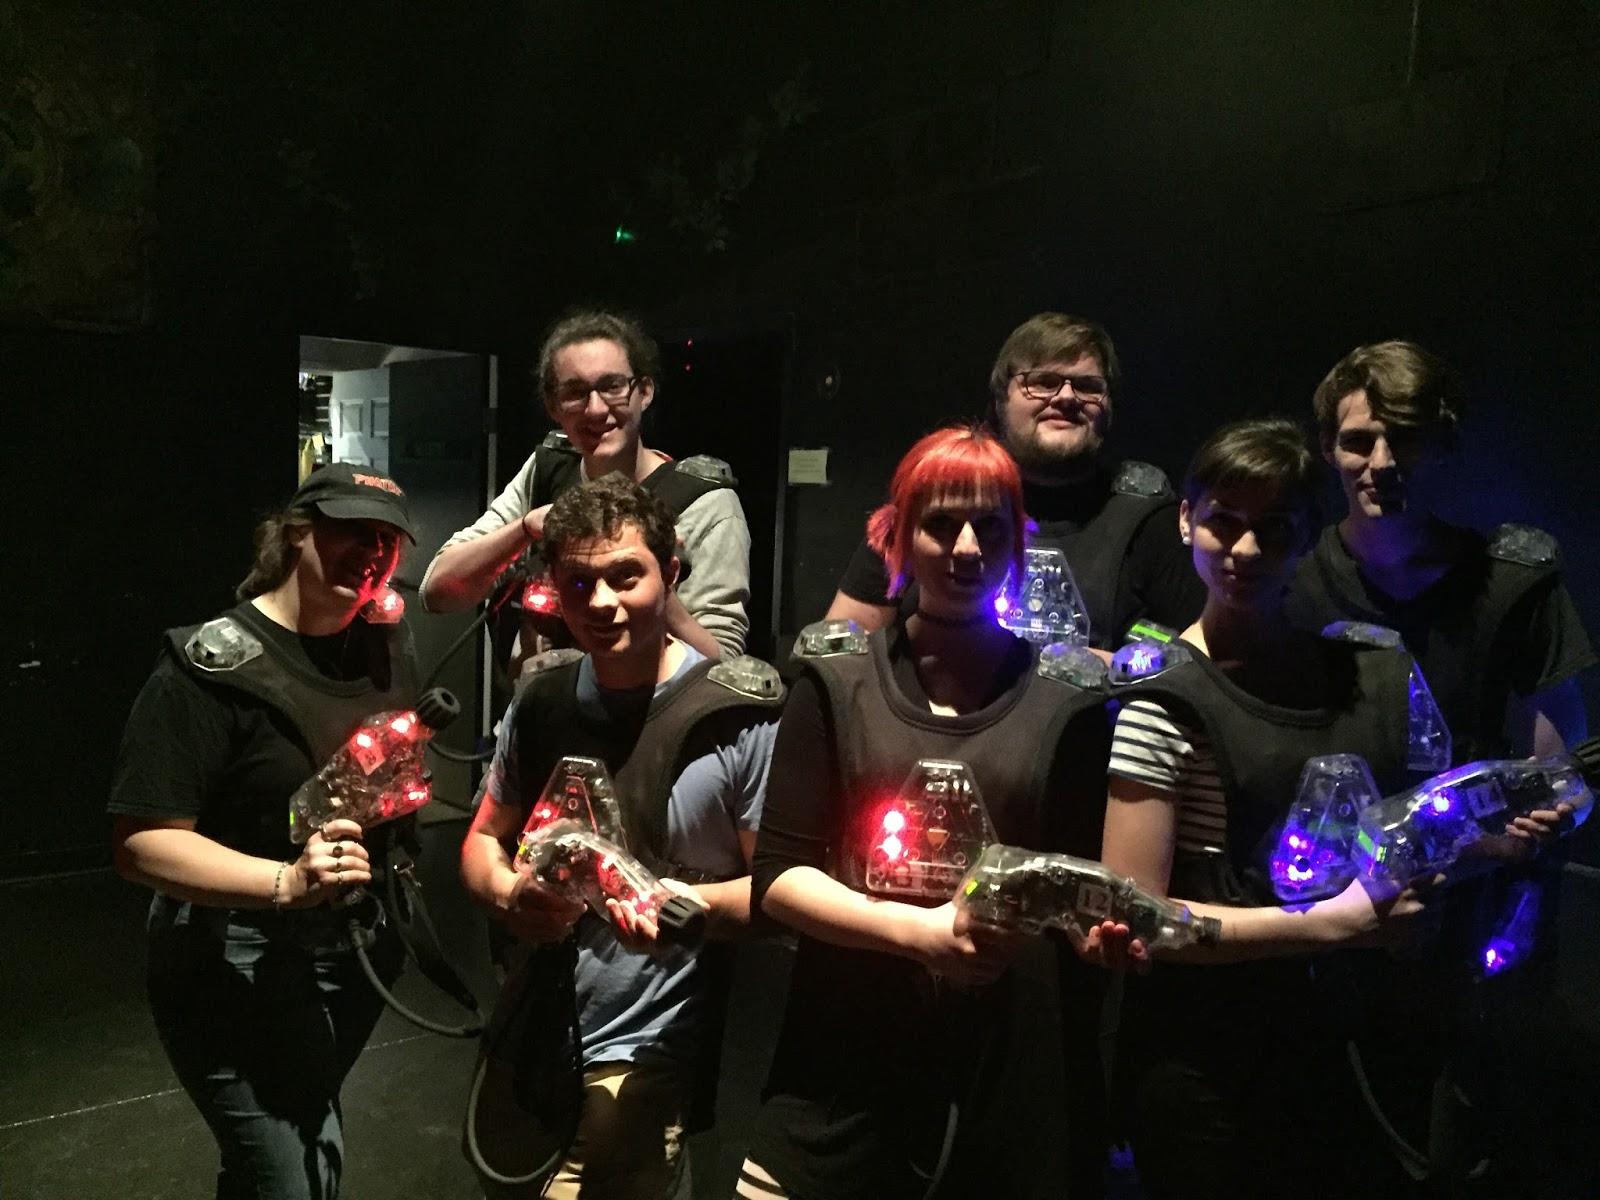 Tiviachick Loves Laser Tag: Frames N Games was a (Hyper) Blast!